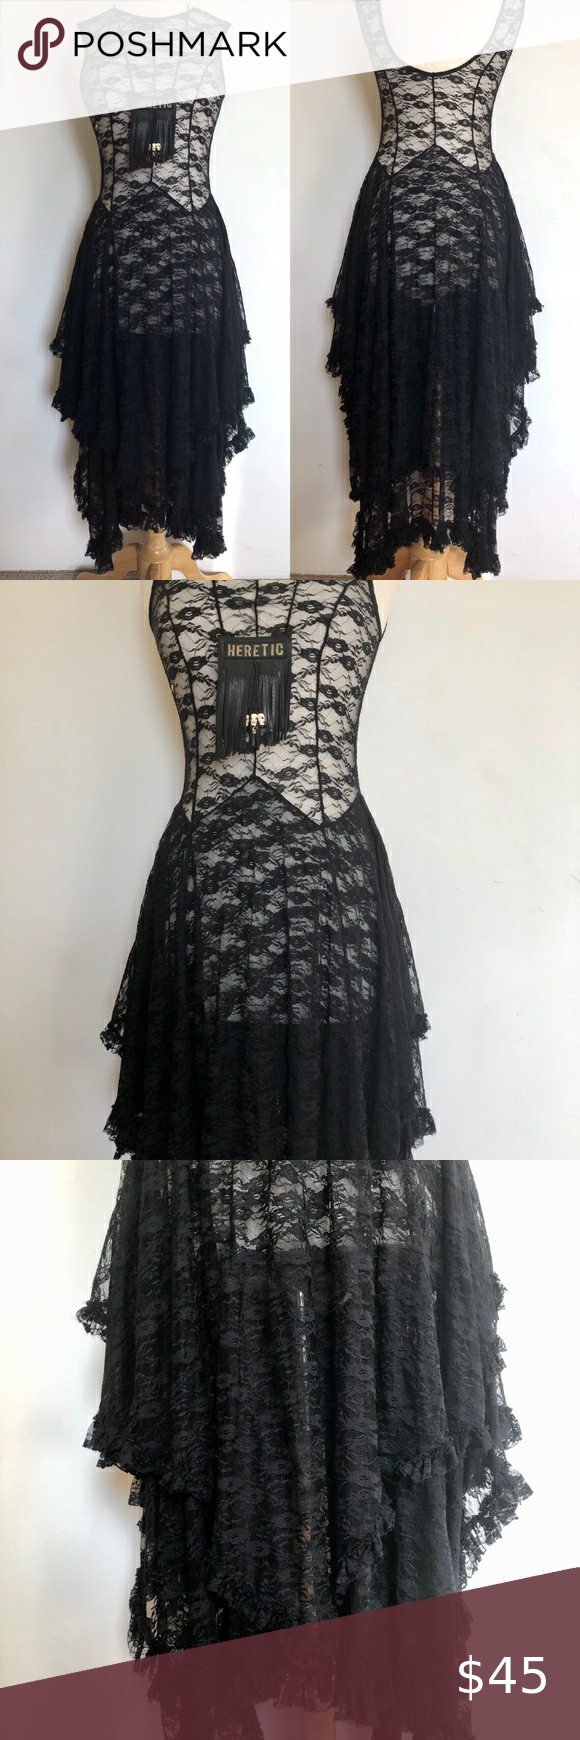 Free People Multi Layer Ultr Goth Black Lace Dress Black Lace Dress Lace Dress Vintage Lace Dress [ 1740 x 580 Pixel ]